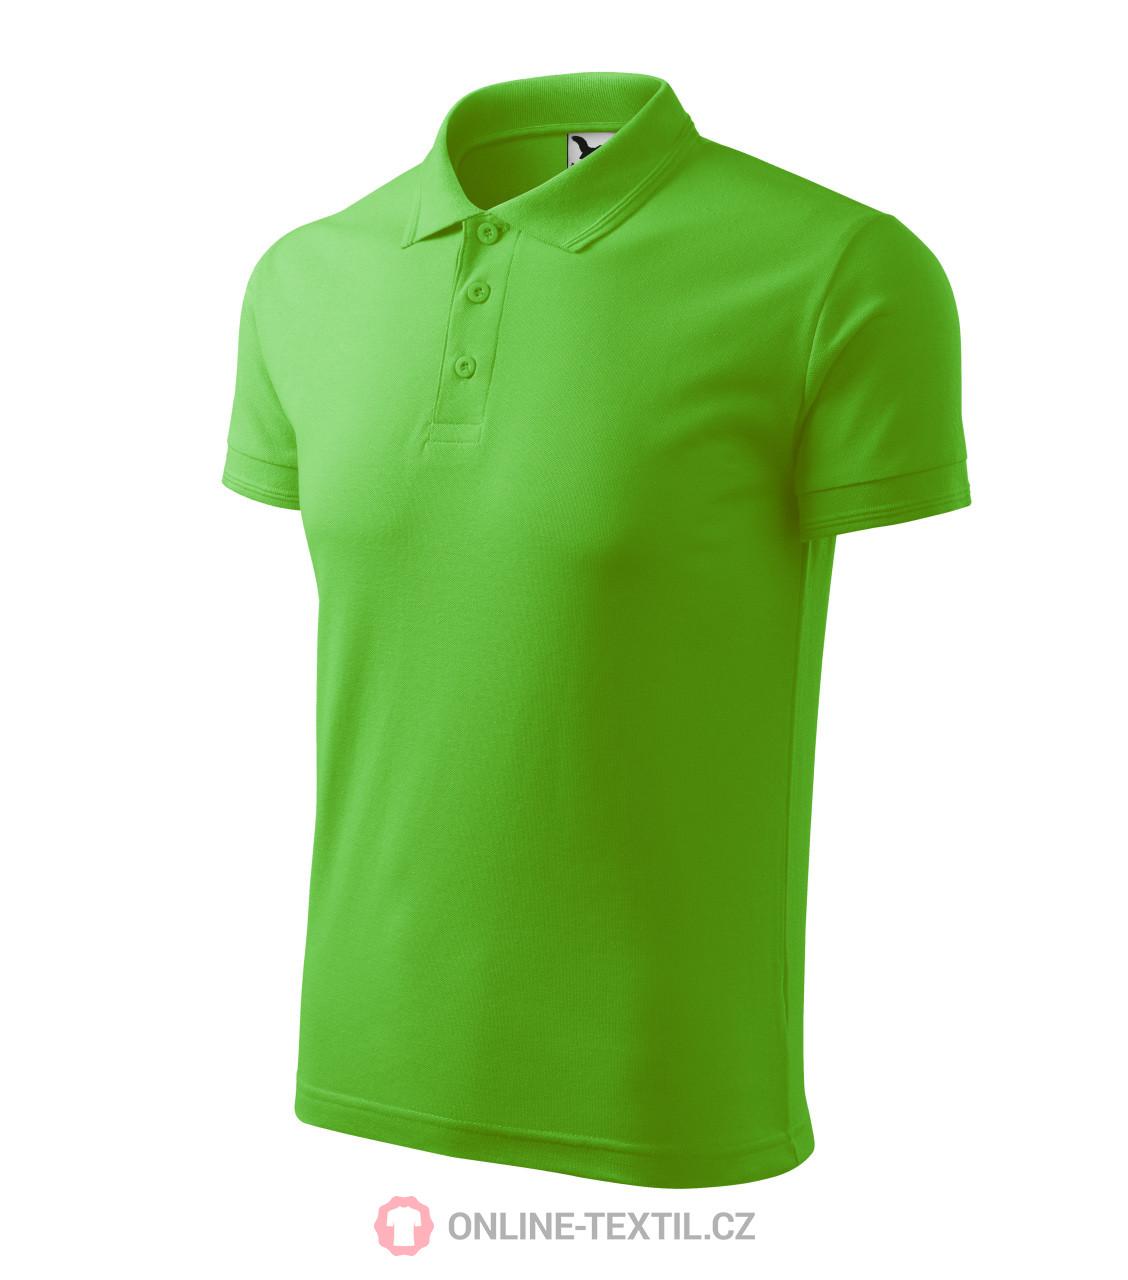 green t shirt polo